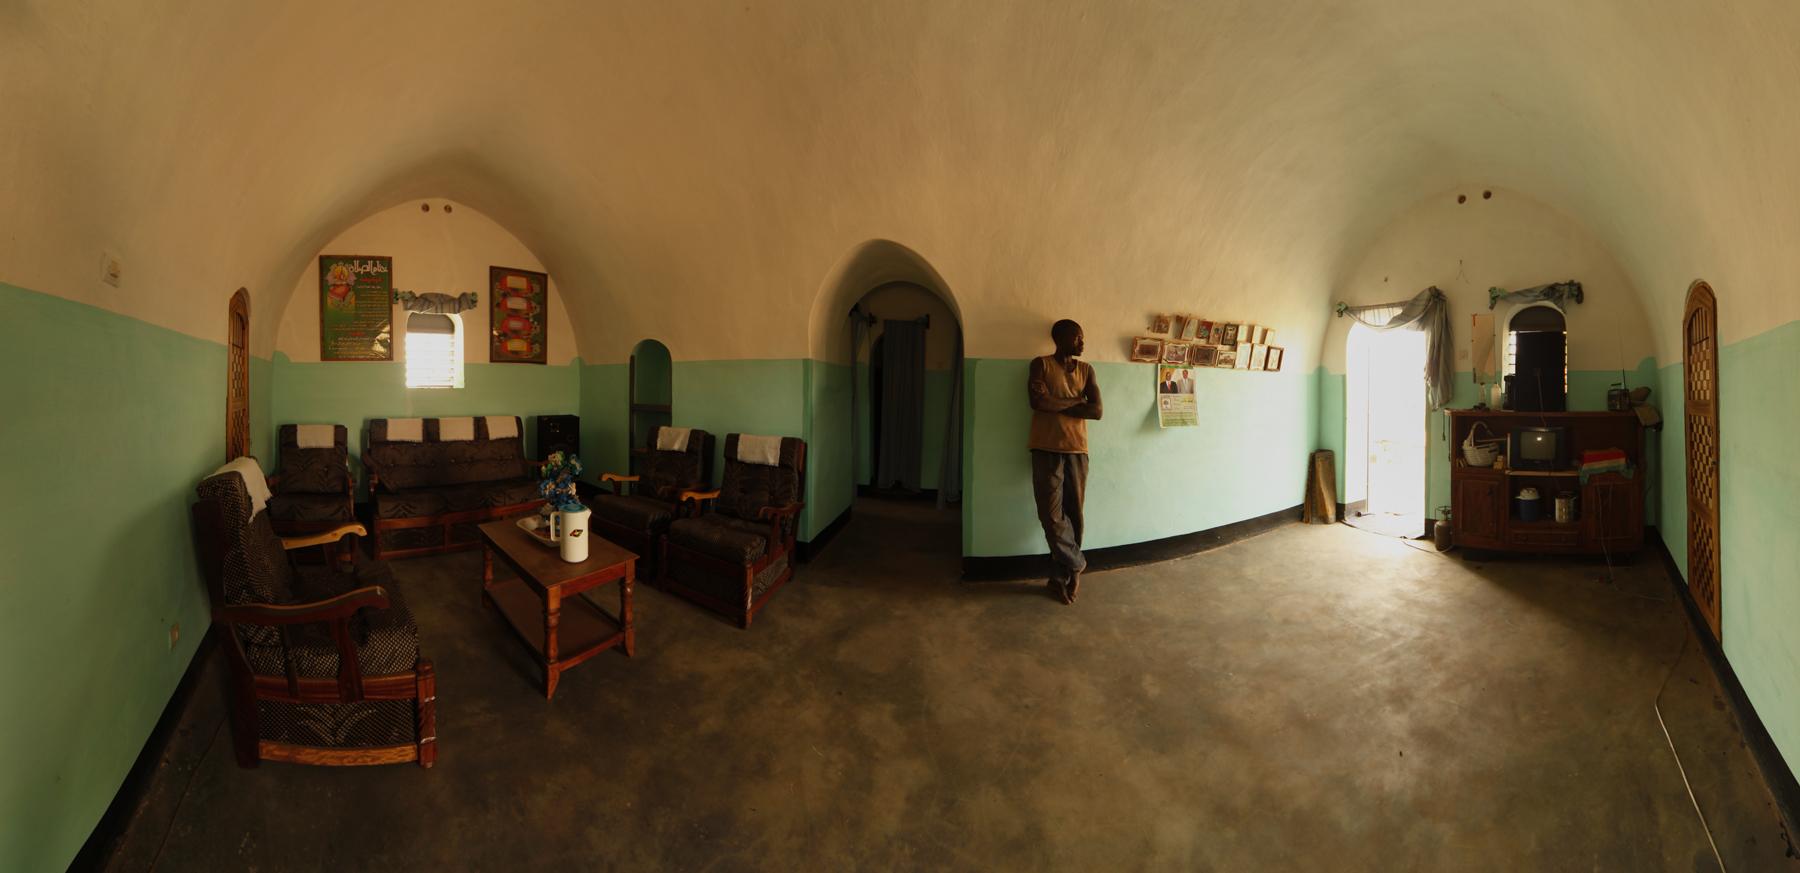 Living_room_-_Earth_Roofs_in_the_Sahel_Program.jpg